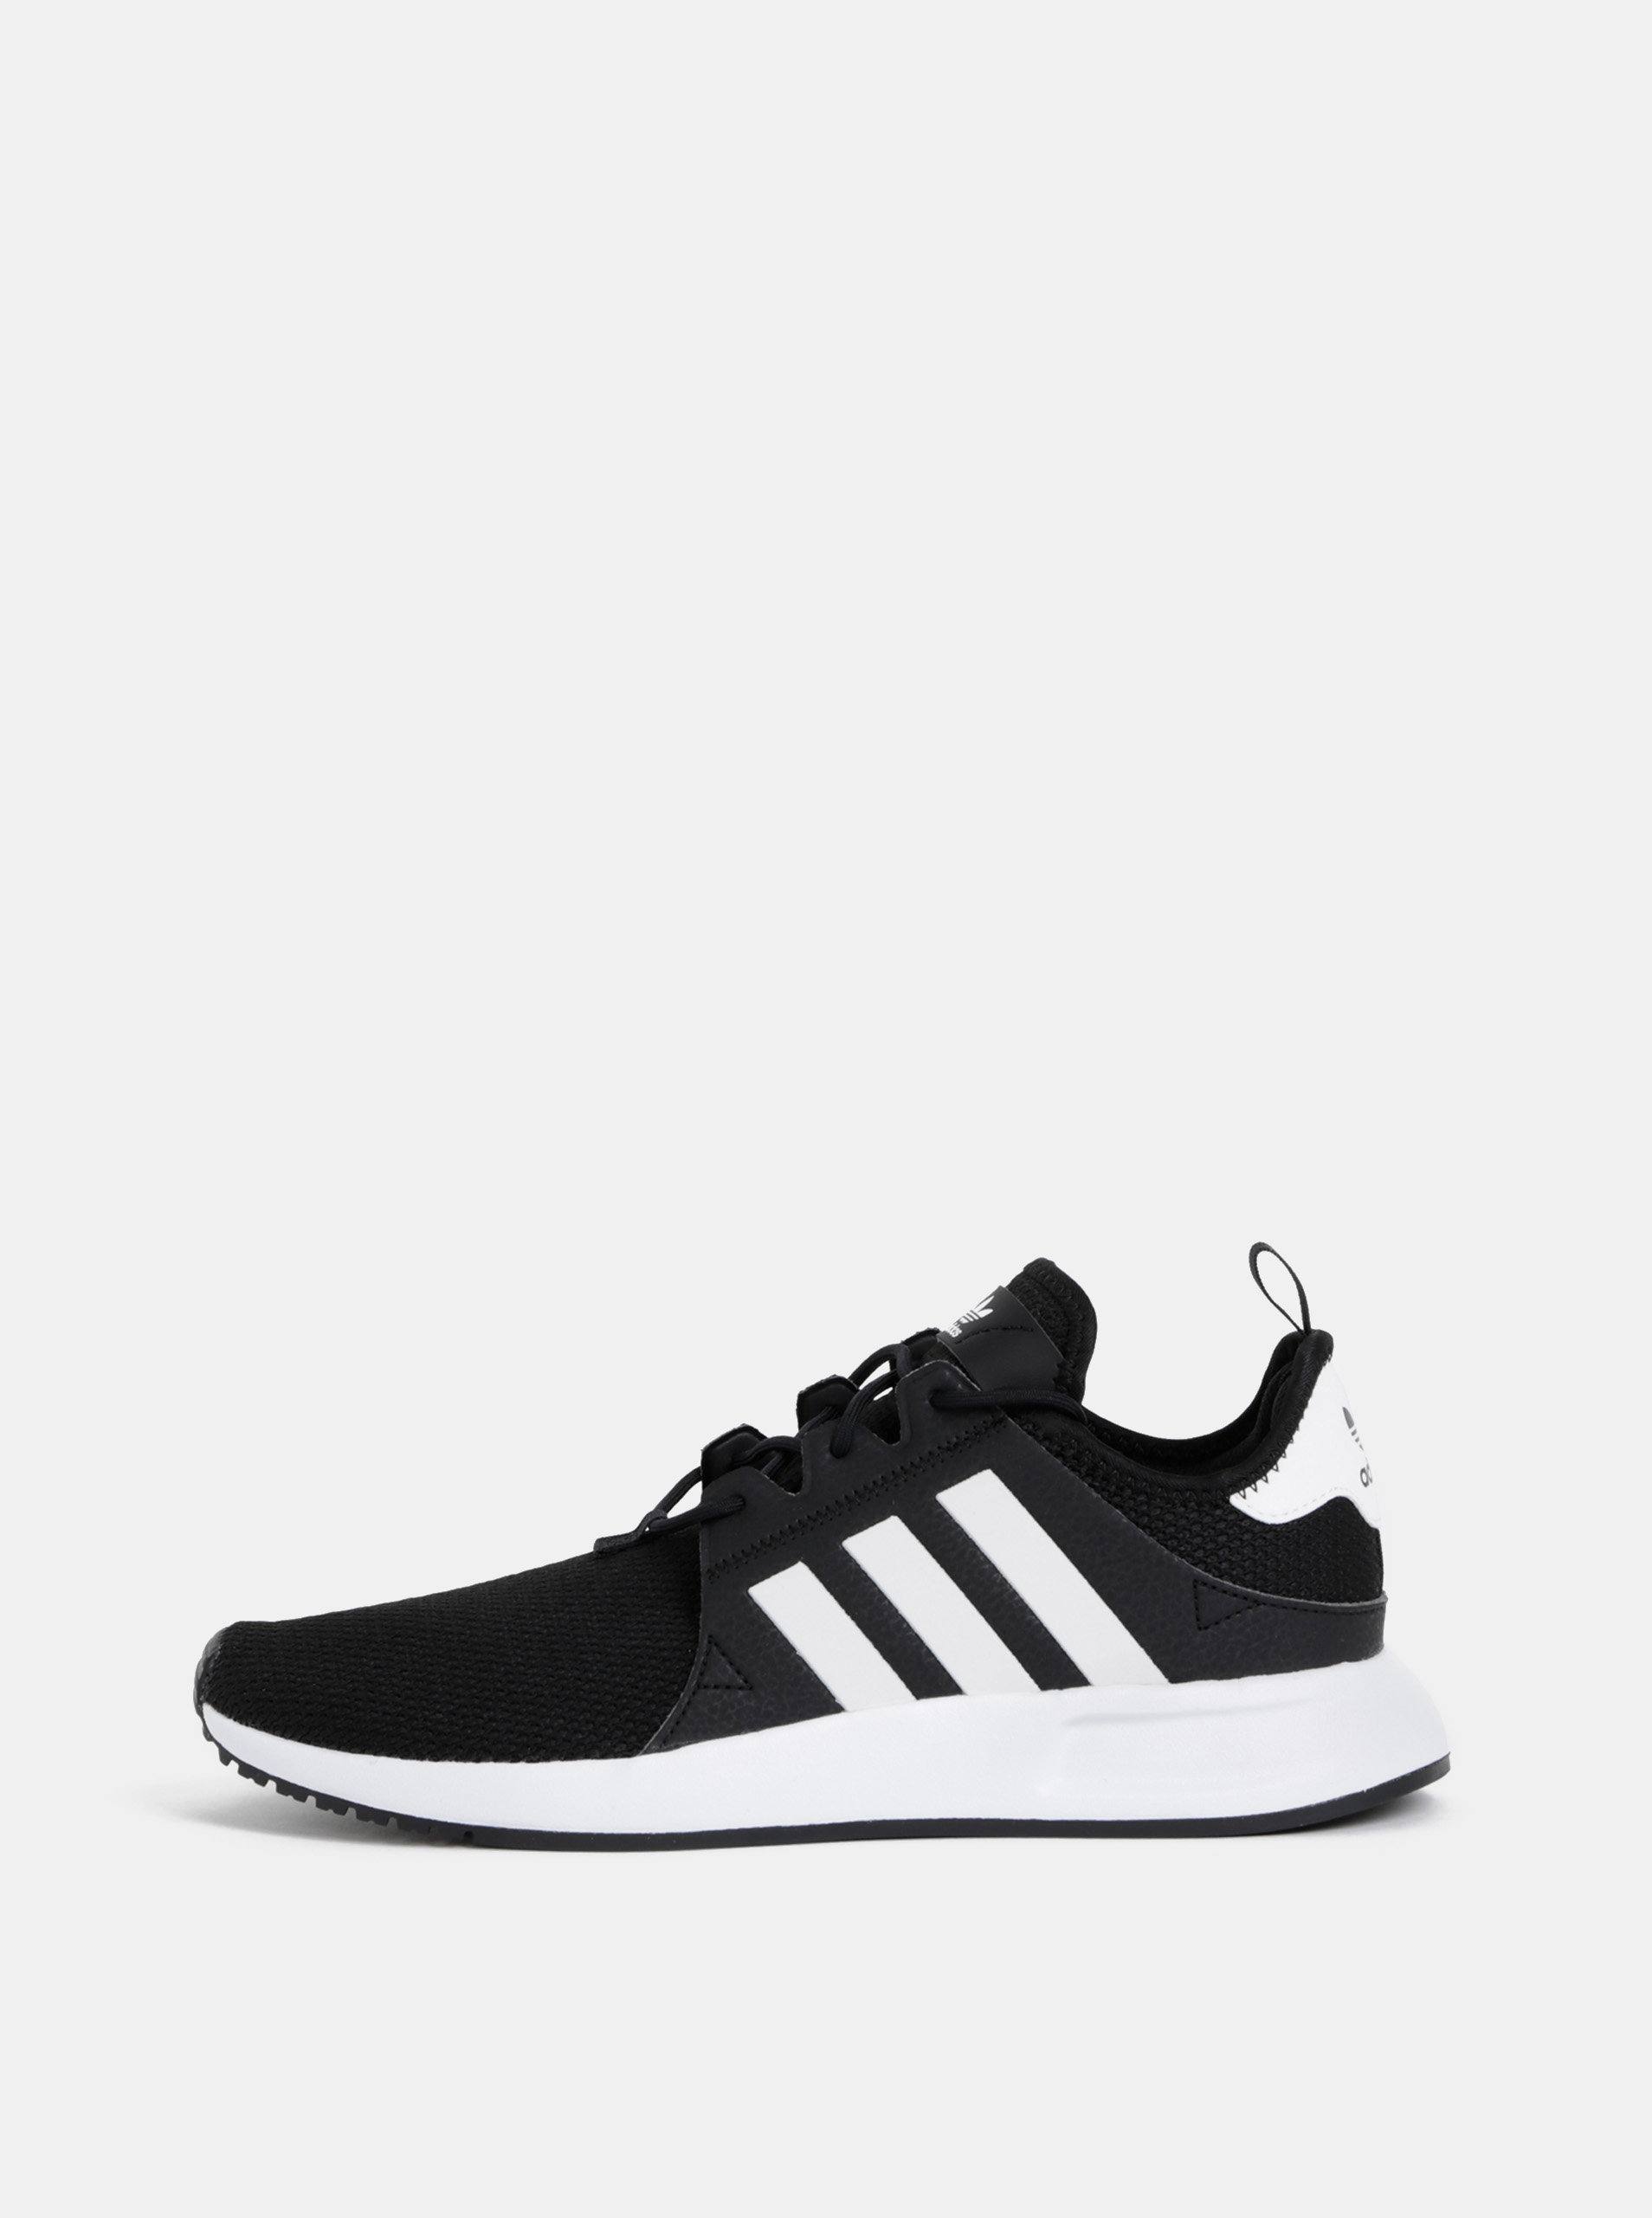 63dc07a688 Čierne pánske tenisky adidas Originals X PLR ...